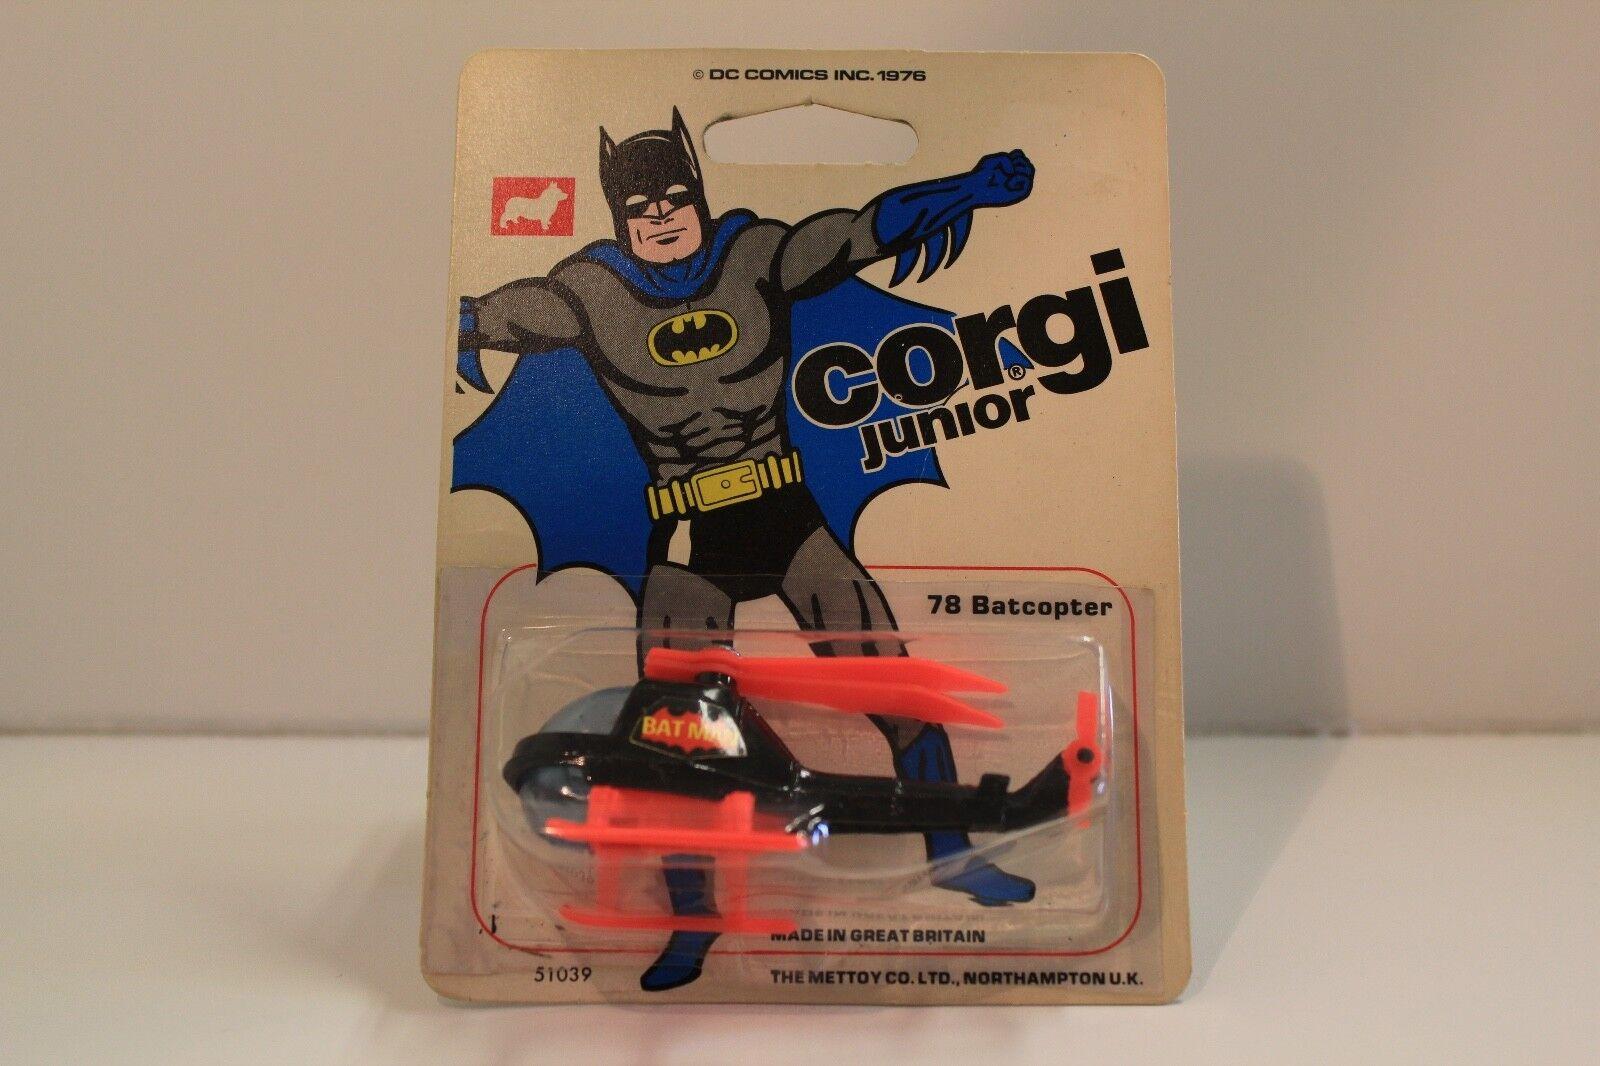 Corgi Junior no  78  Batman's baticóptero  - nero (1976) original sin abrir